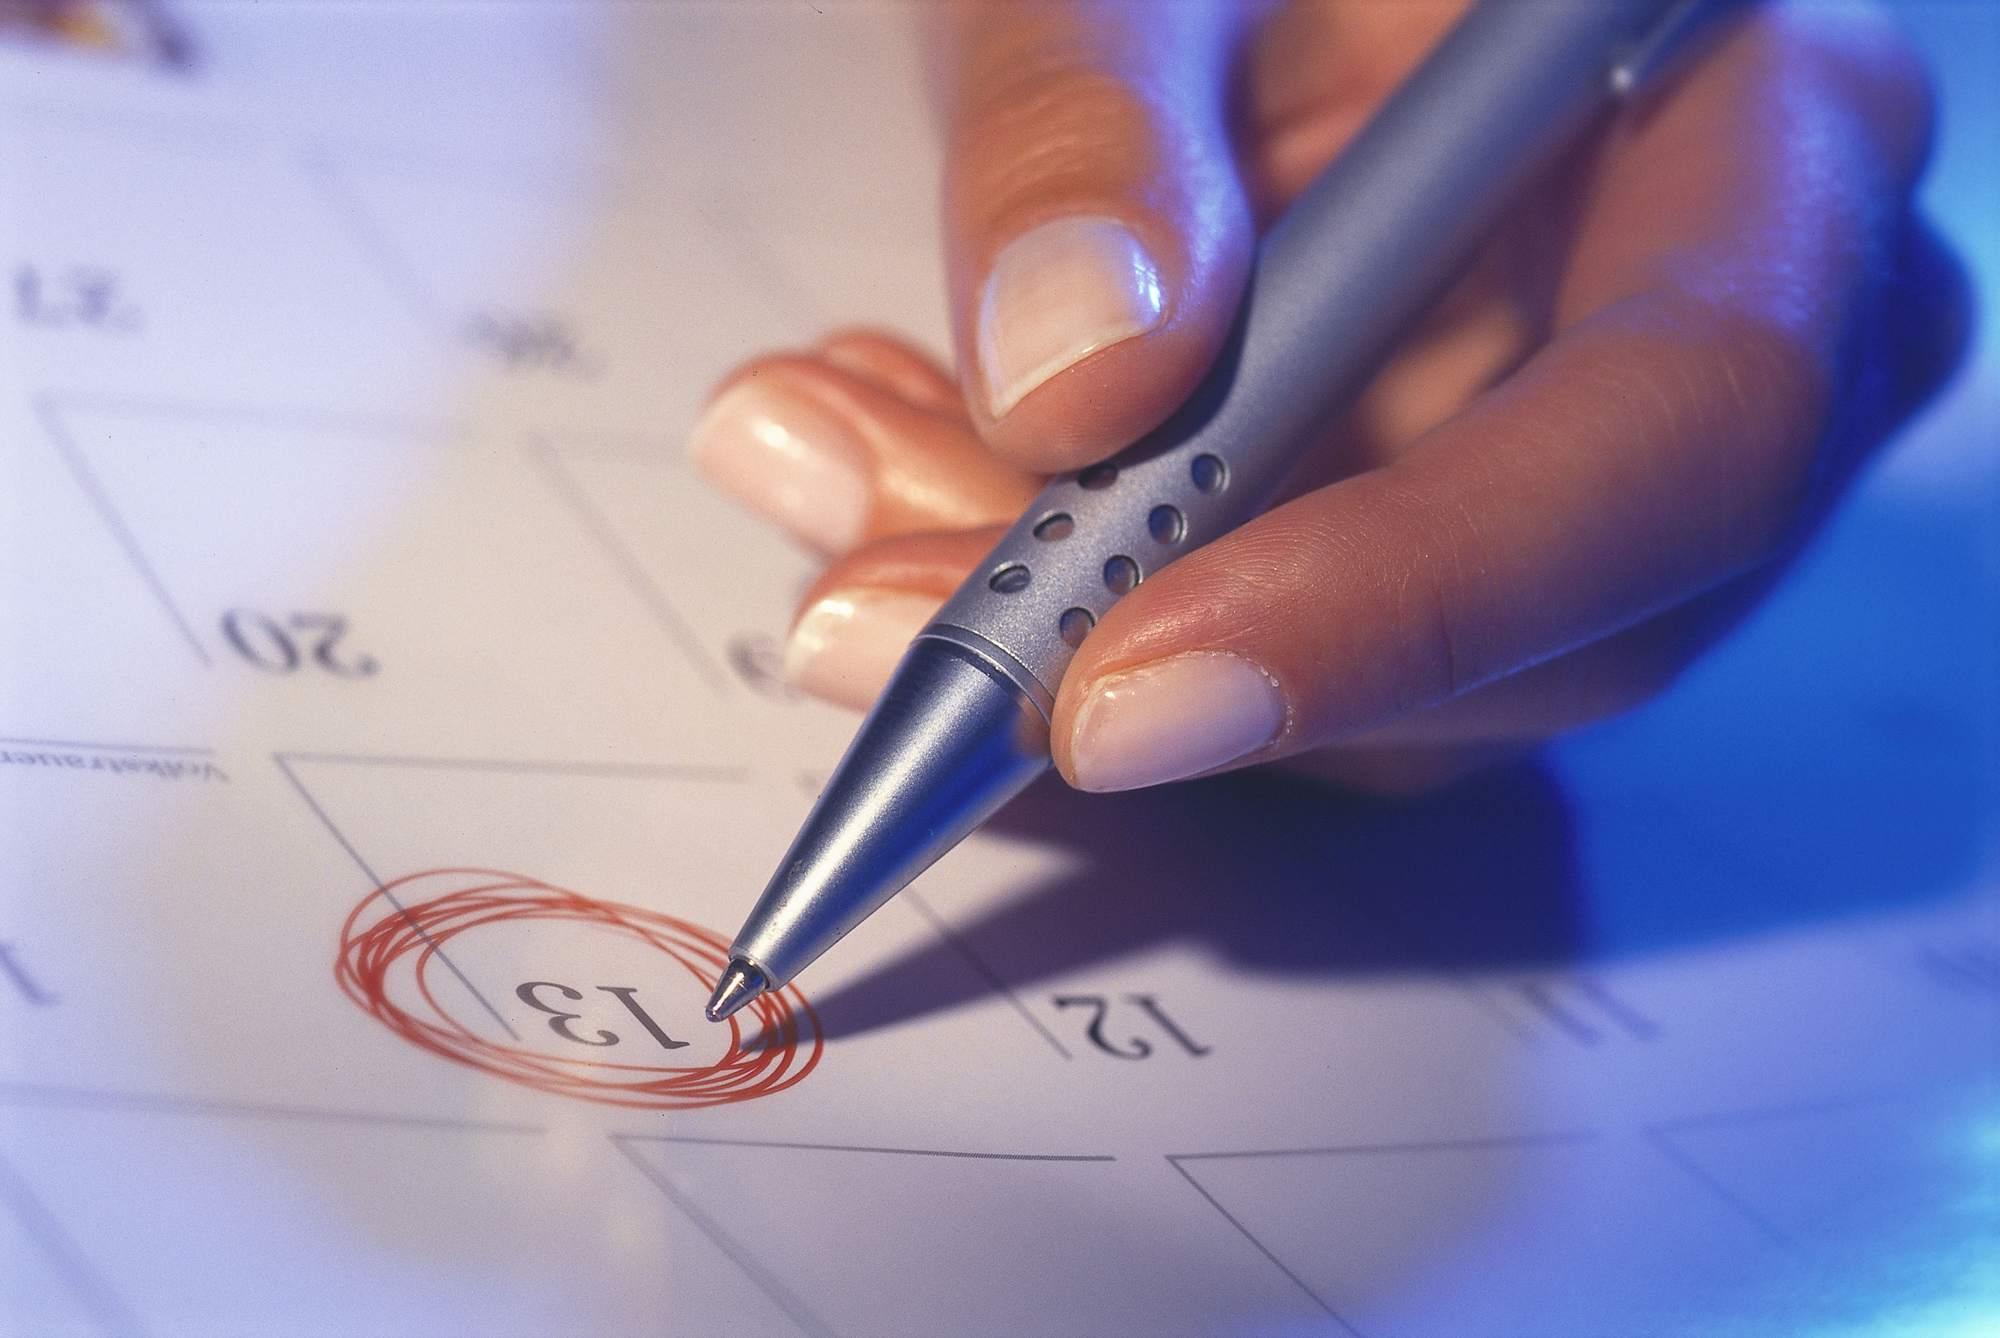 hand circling calendar date with pen